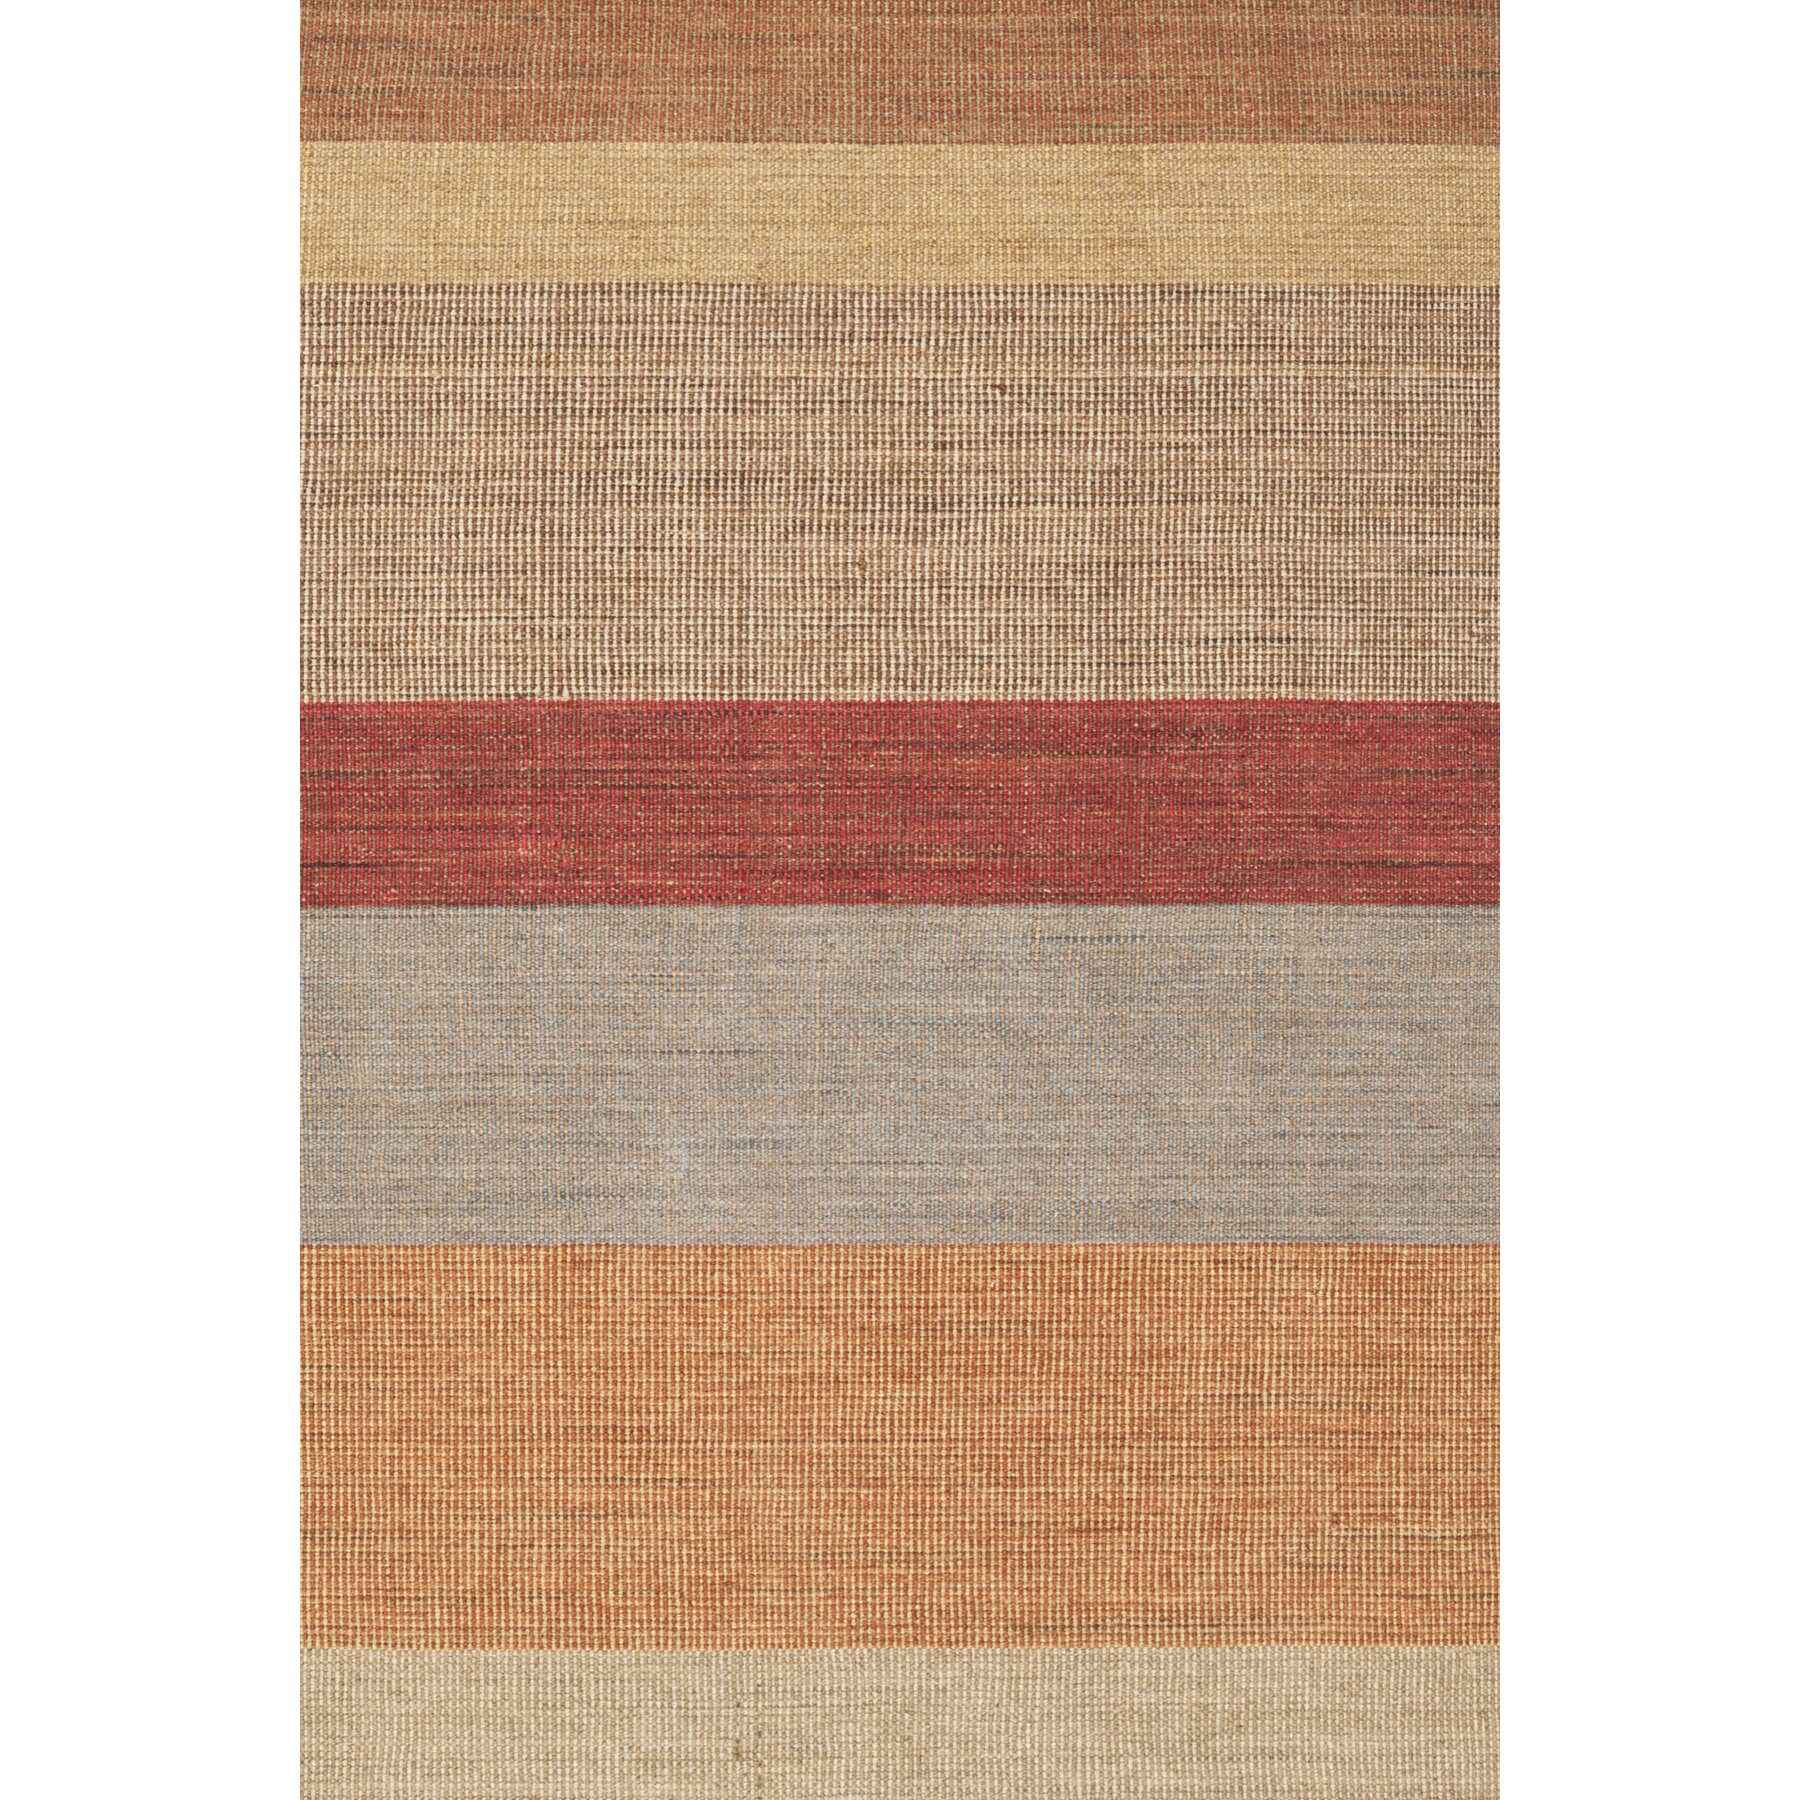 dash and albert rugs hand woven beige area rug reviews wayfair. Black Bedroom Furniture Sets. Home Design Ideas